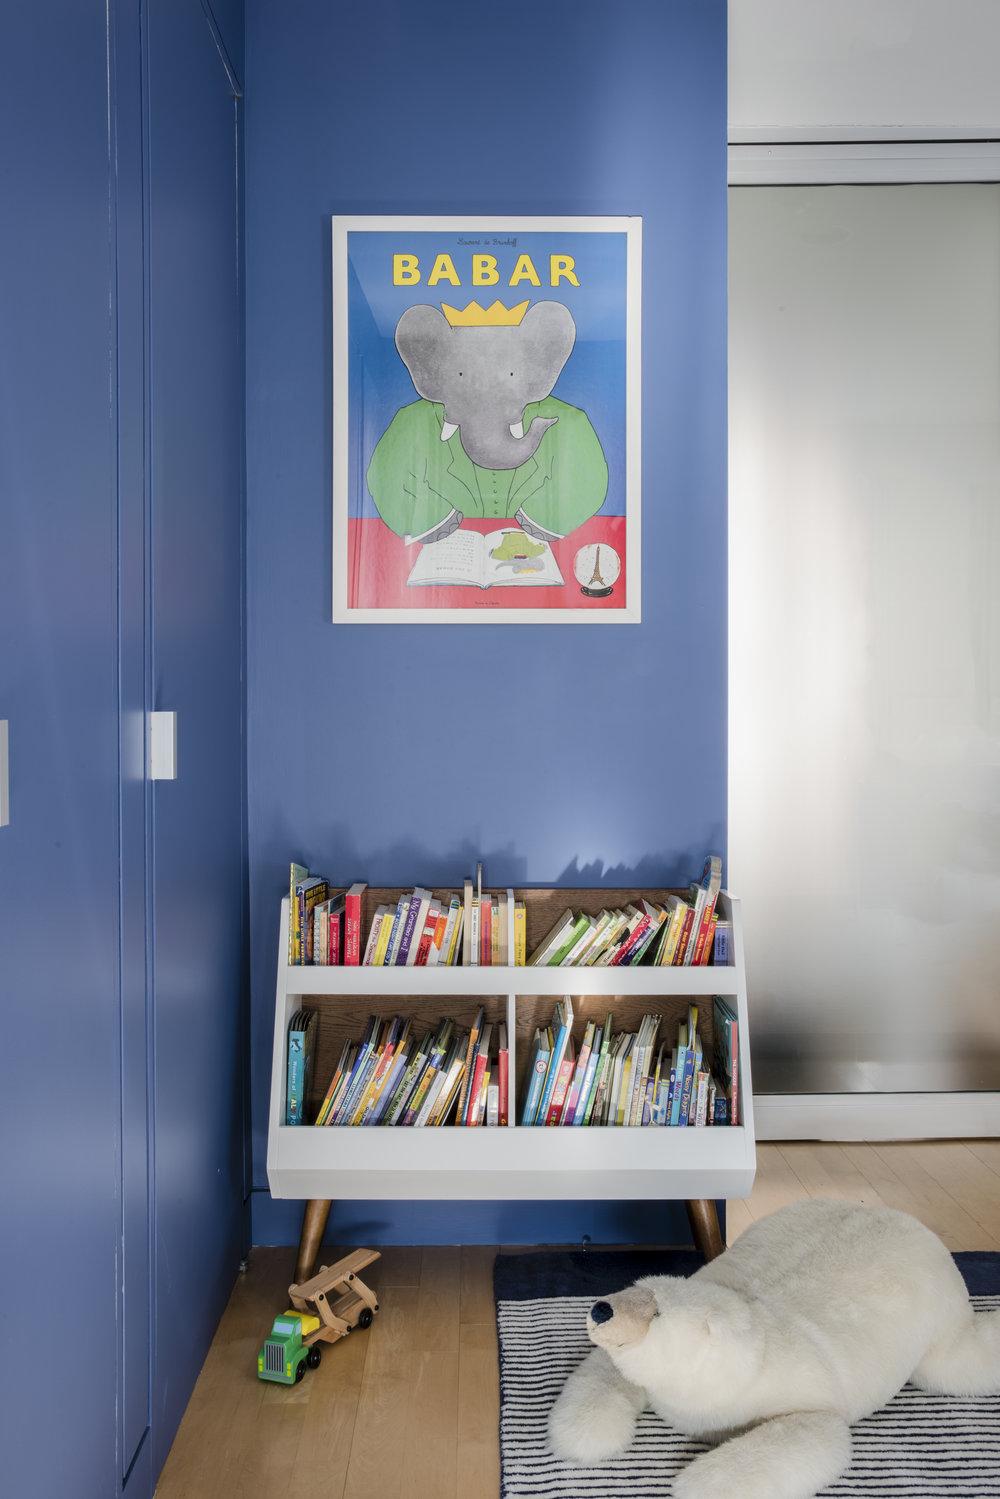 barbar1.jpg